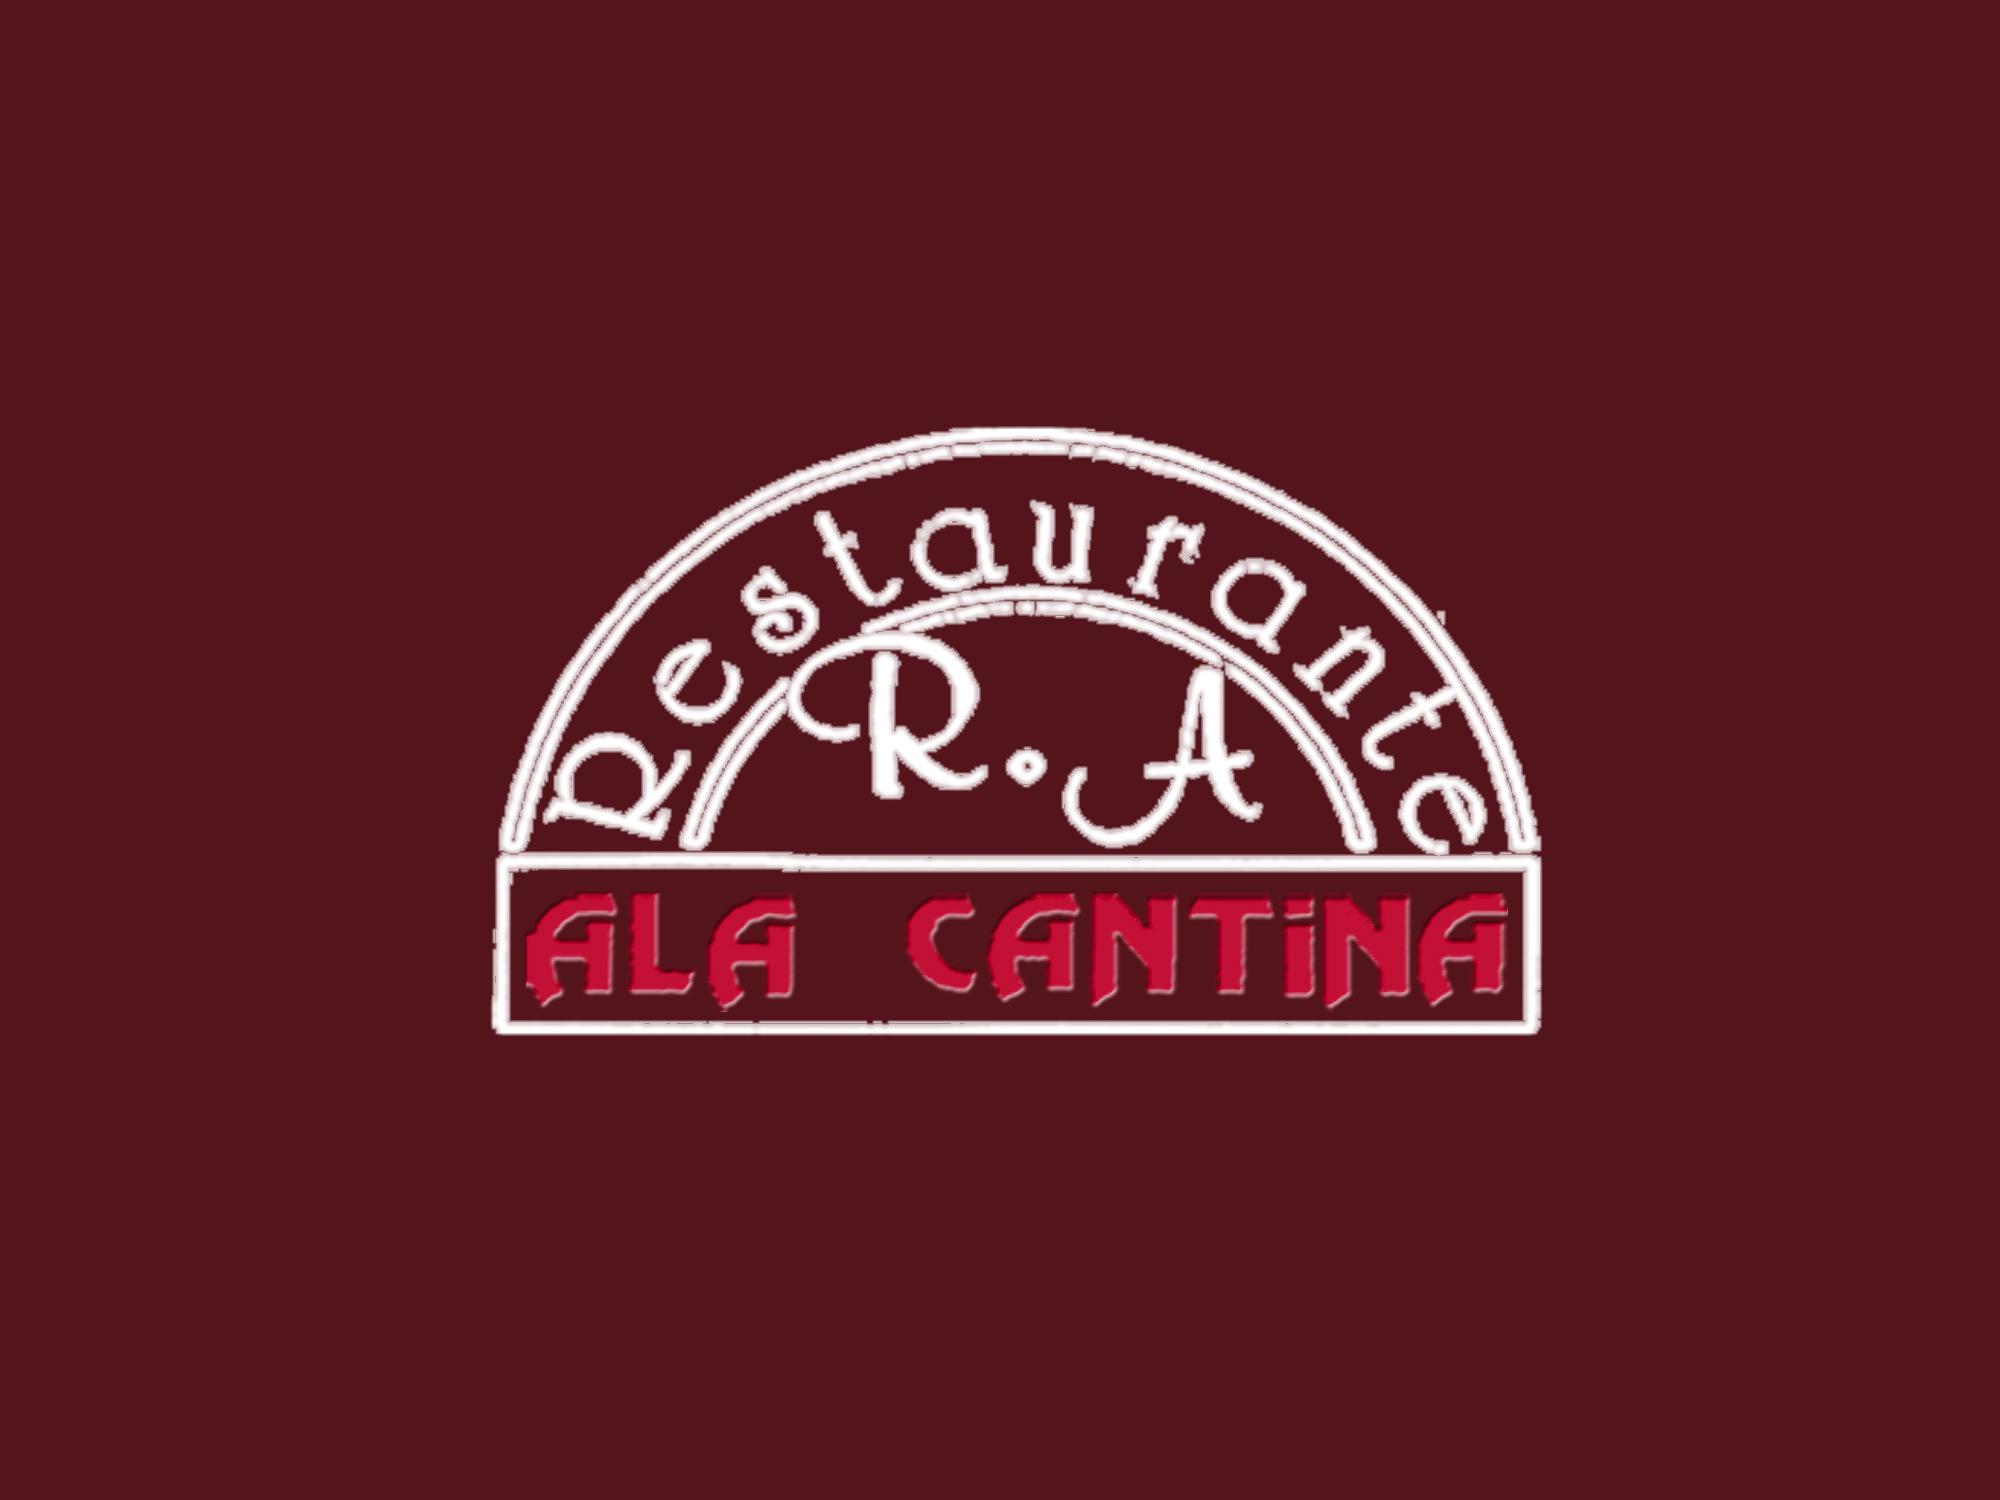 RESTAURANTE ALA CANTINA